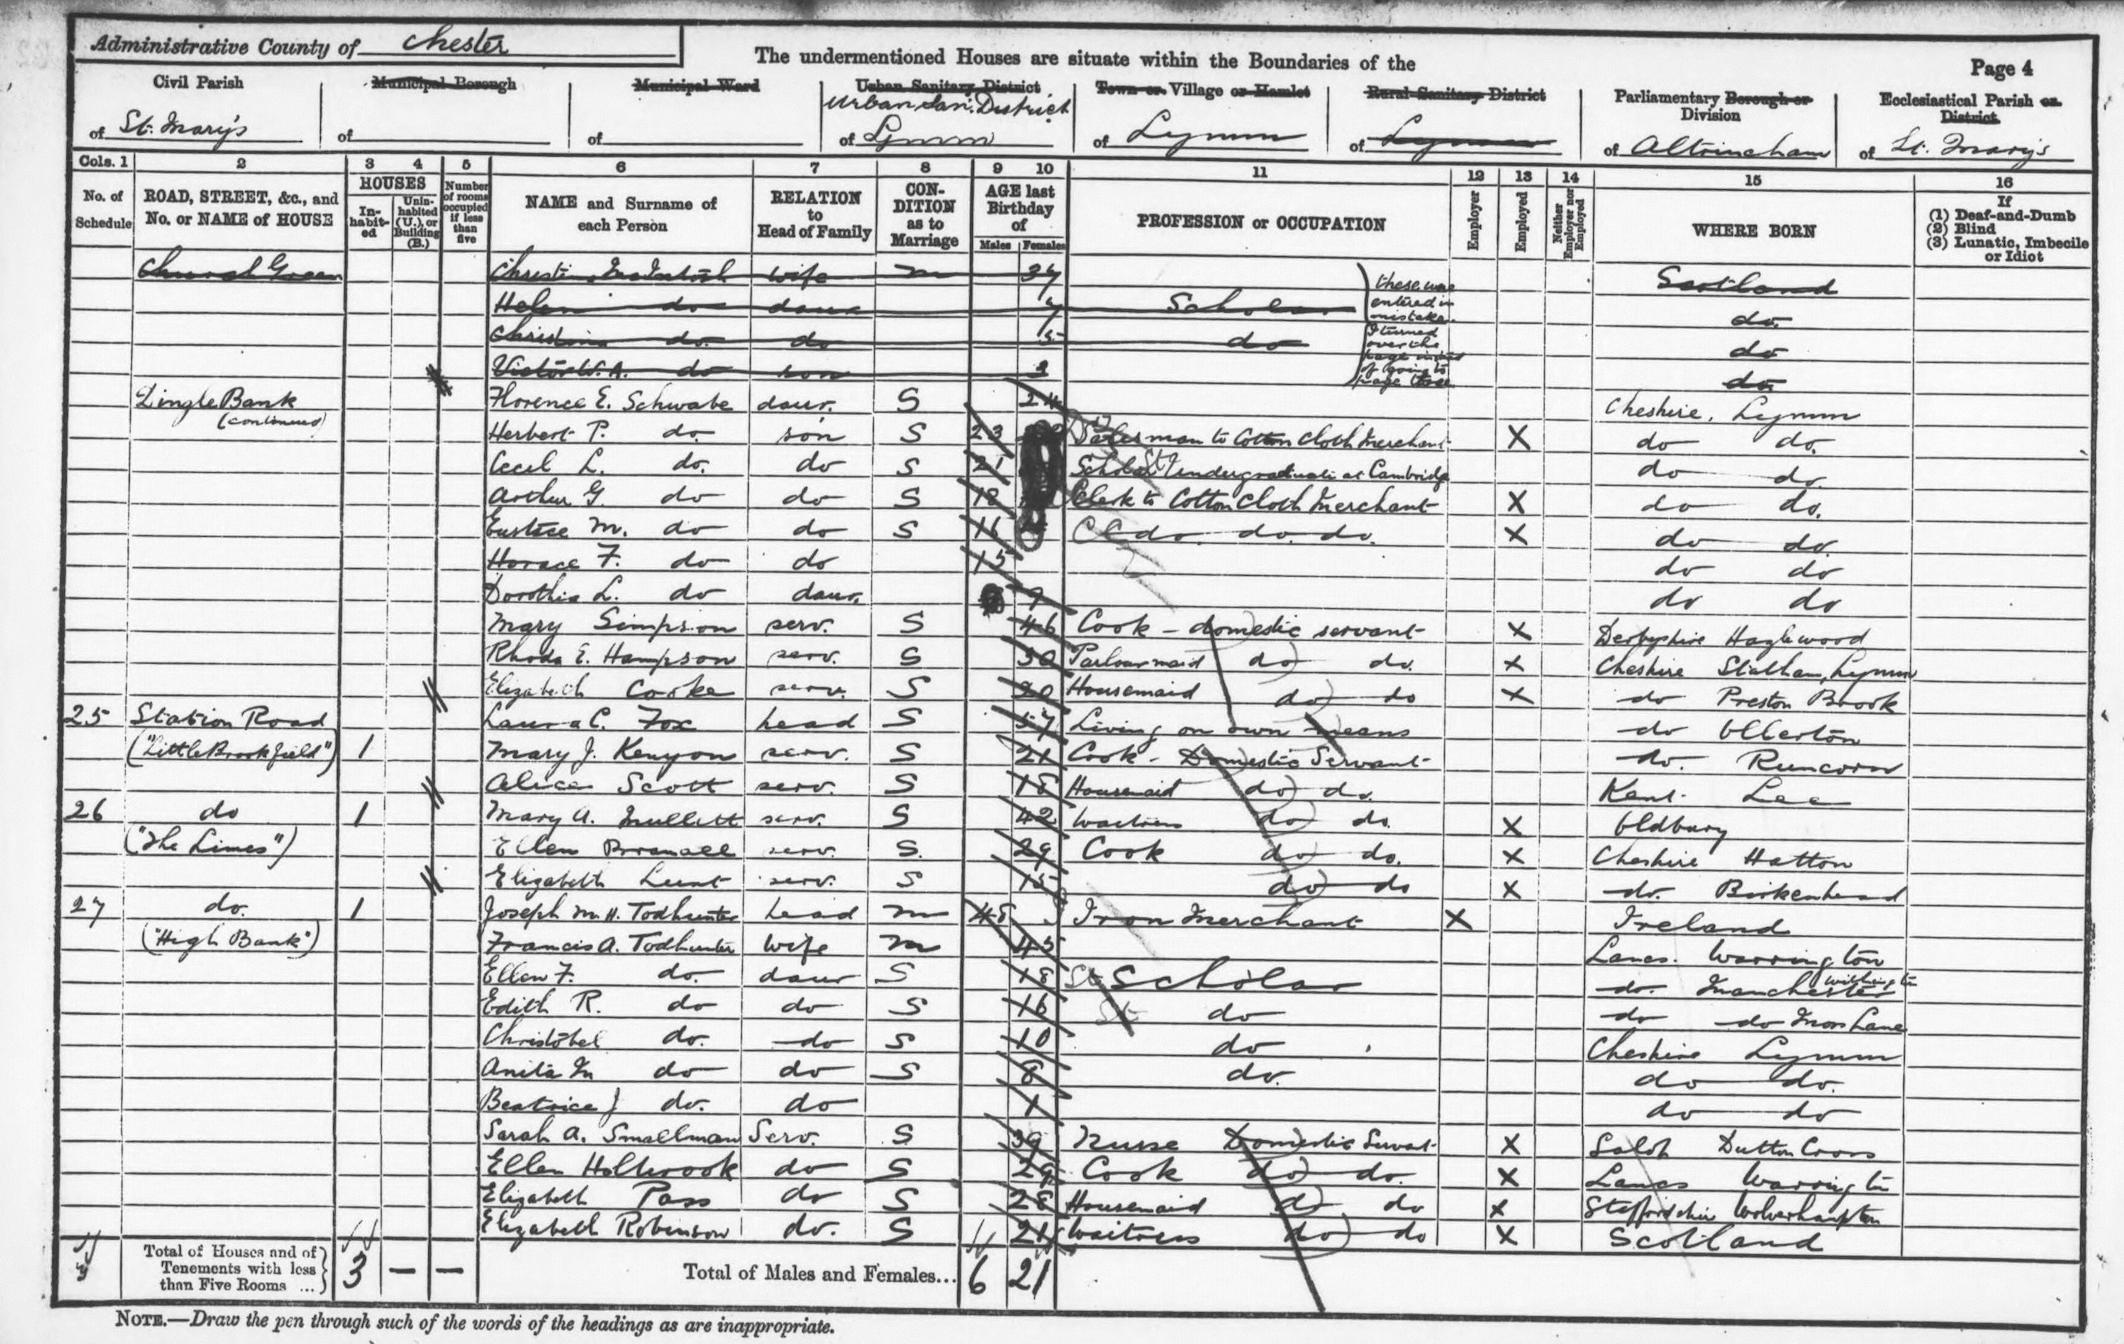 Henry Arthur Schwabe on 1891 census